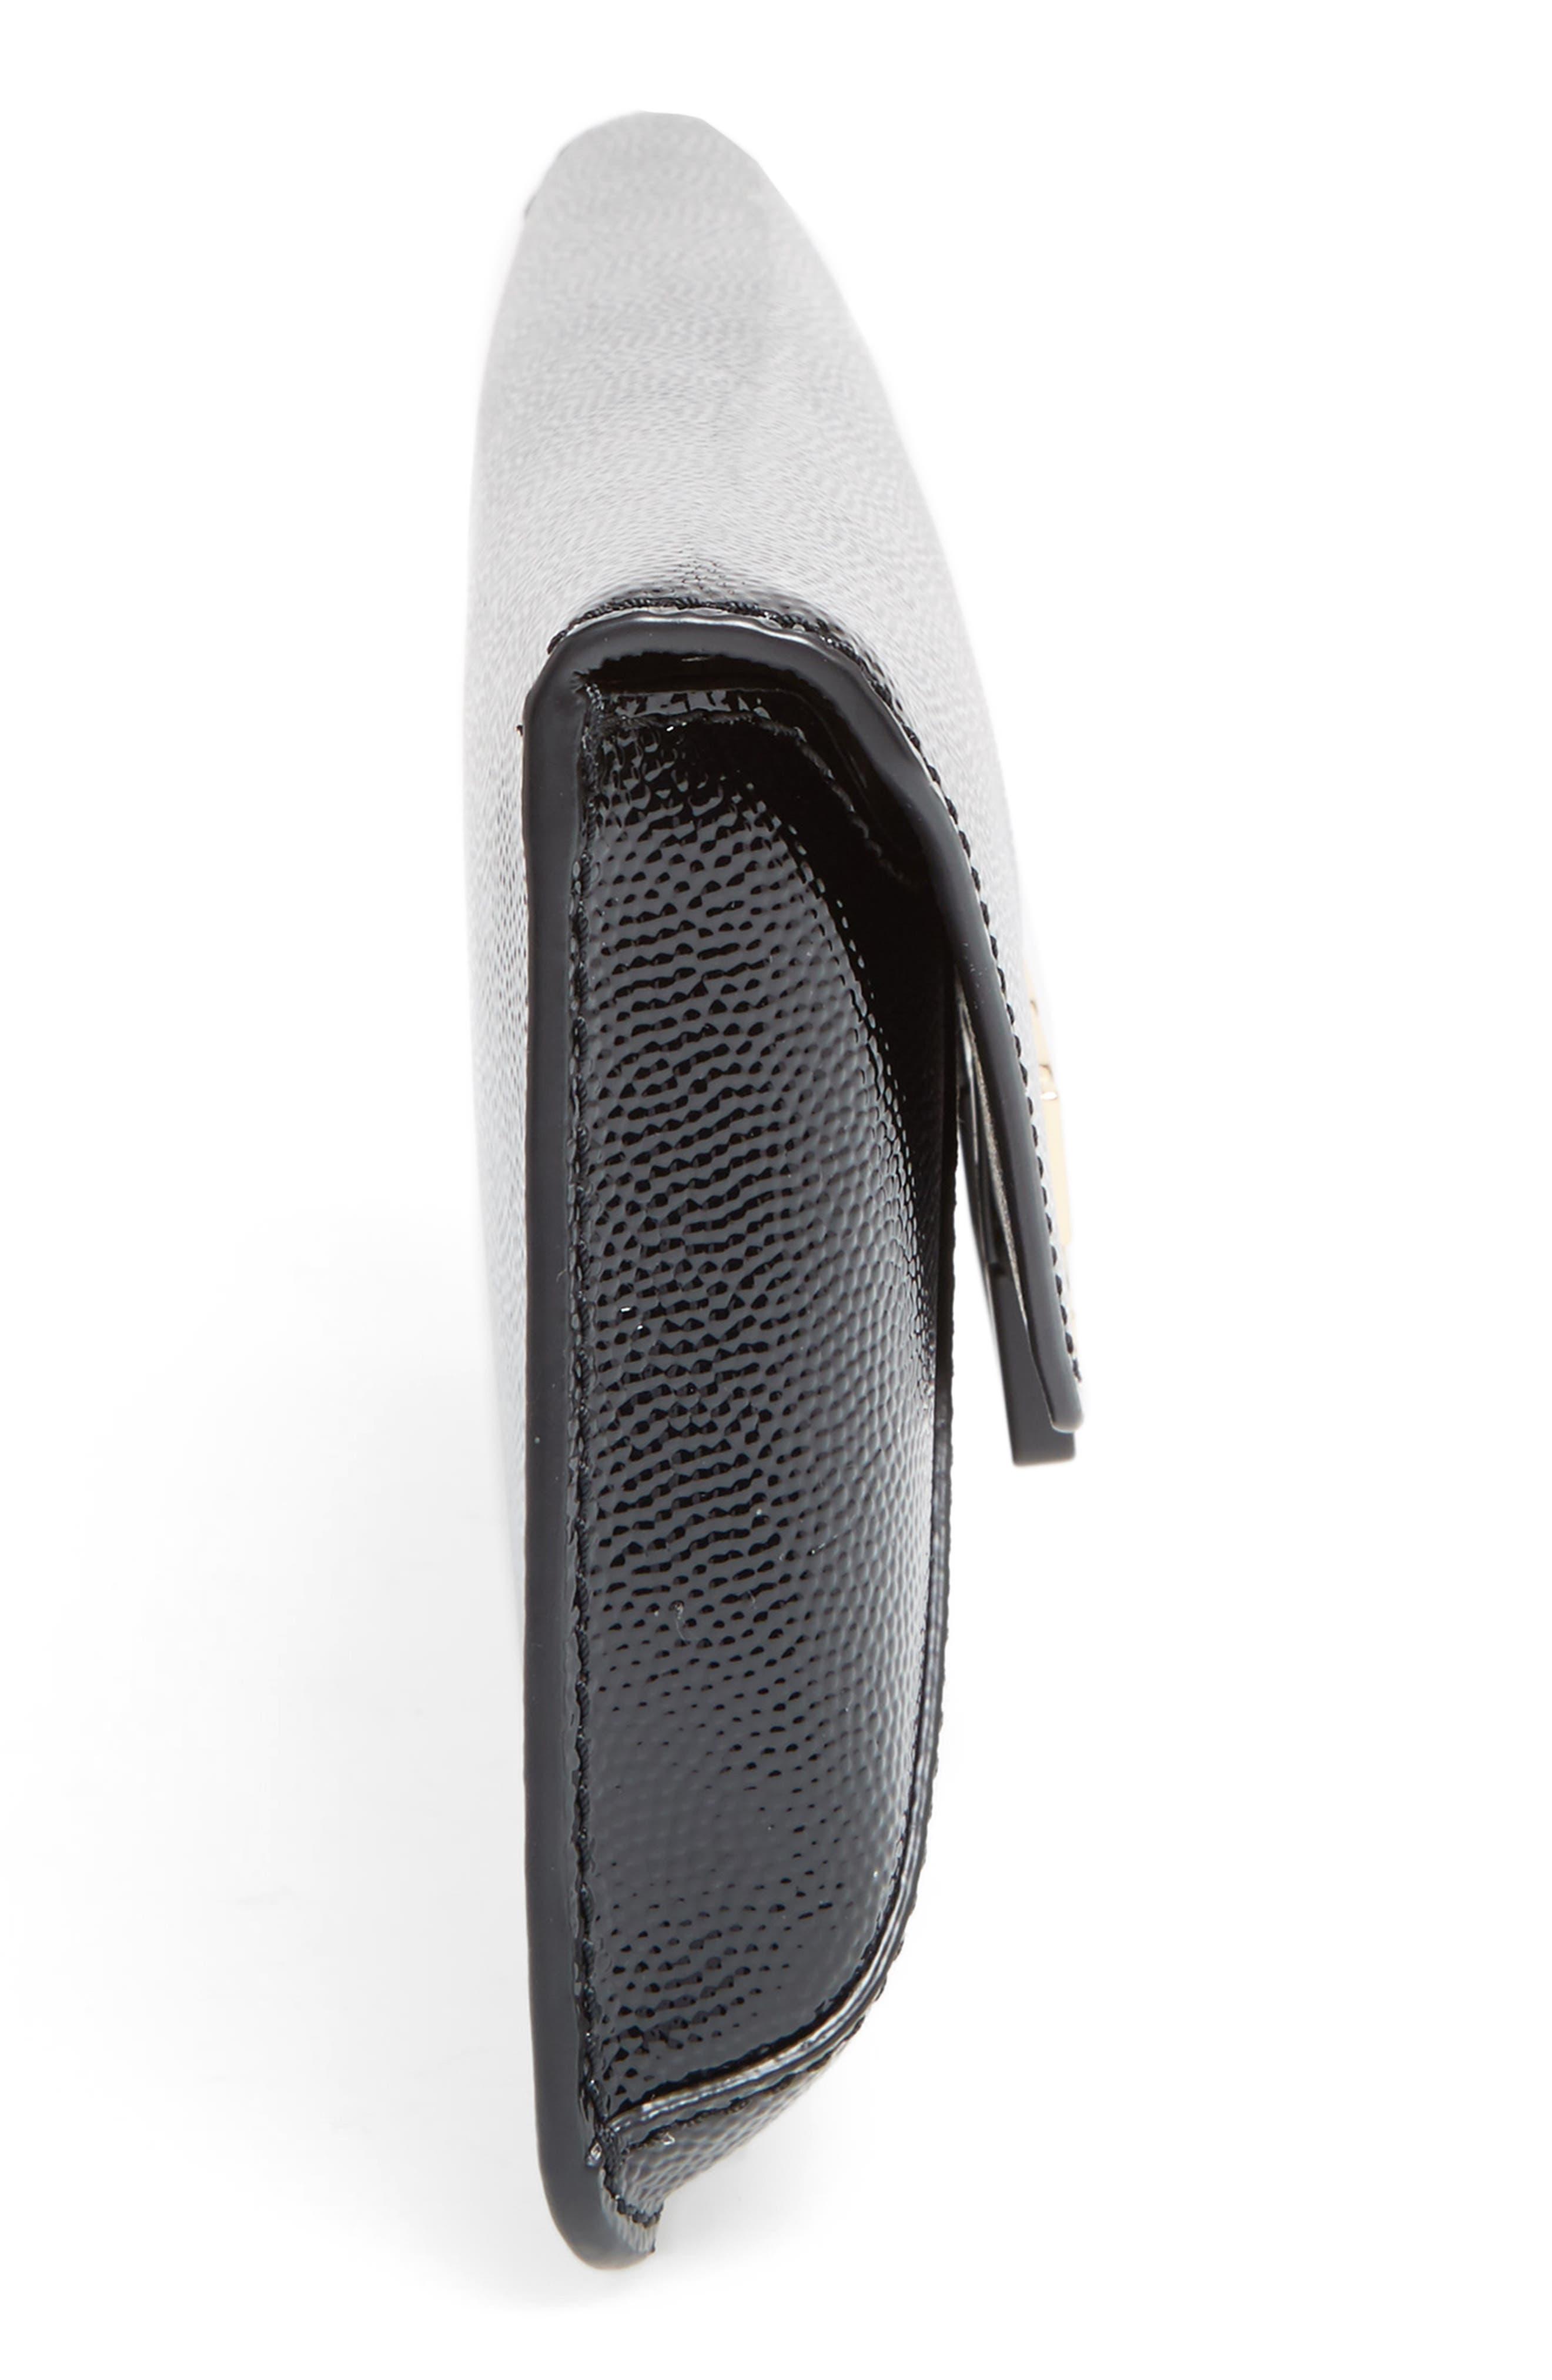 TORY BURCH, Gigi Caviar Leather Clutch, Alternate thumbnail 4, color, 001